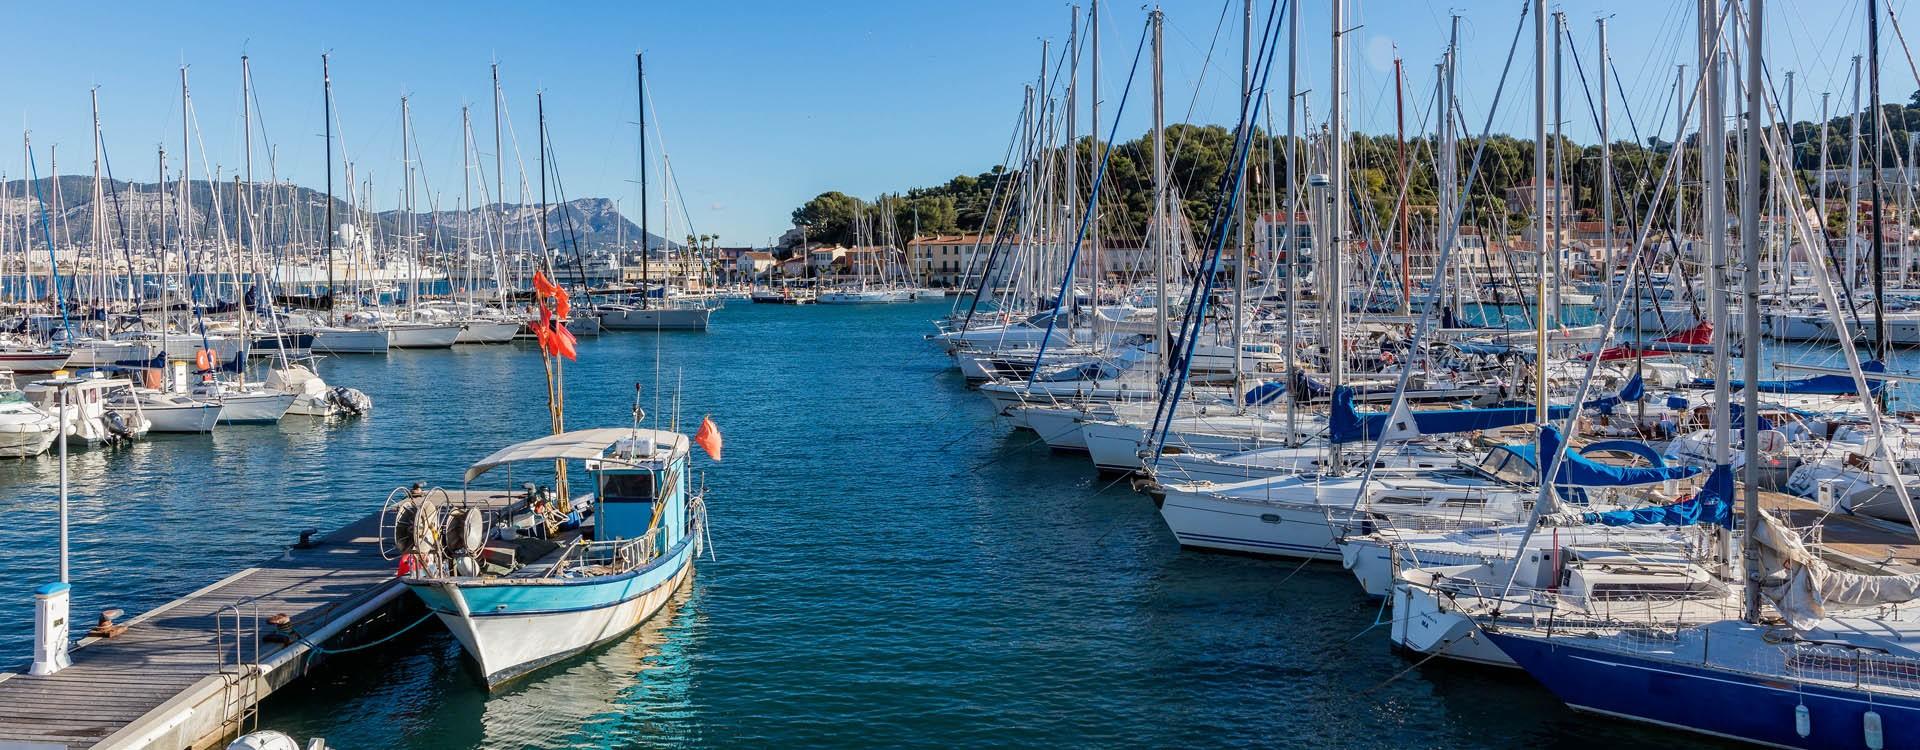 Port de Saint Mandrier